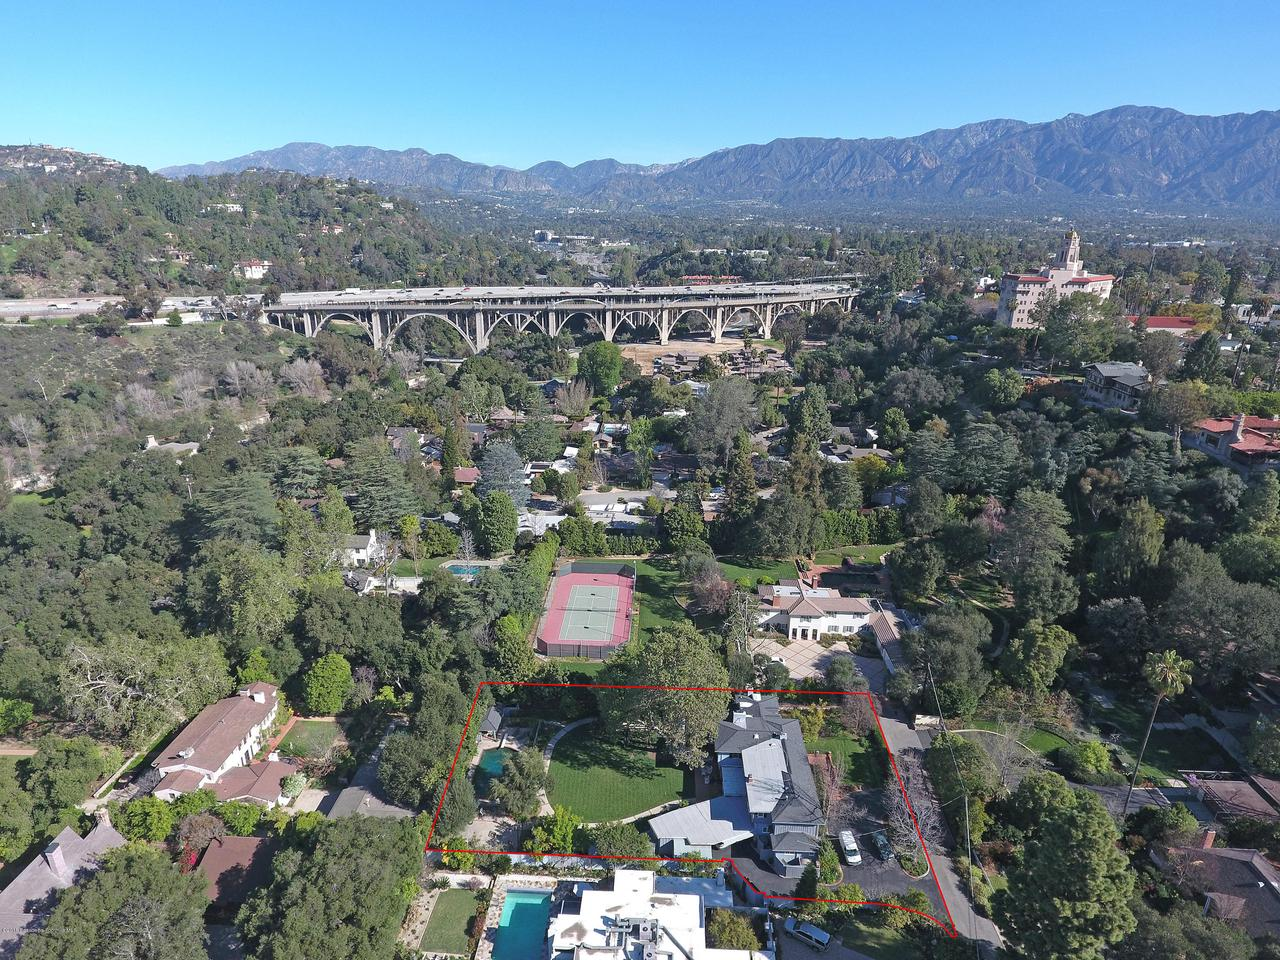 271 CALIFORNIA, Pasadena, CA 91105 - 271-aerial